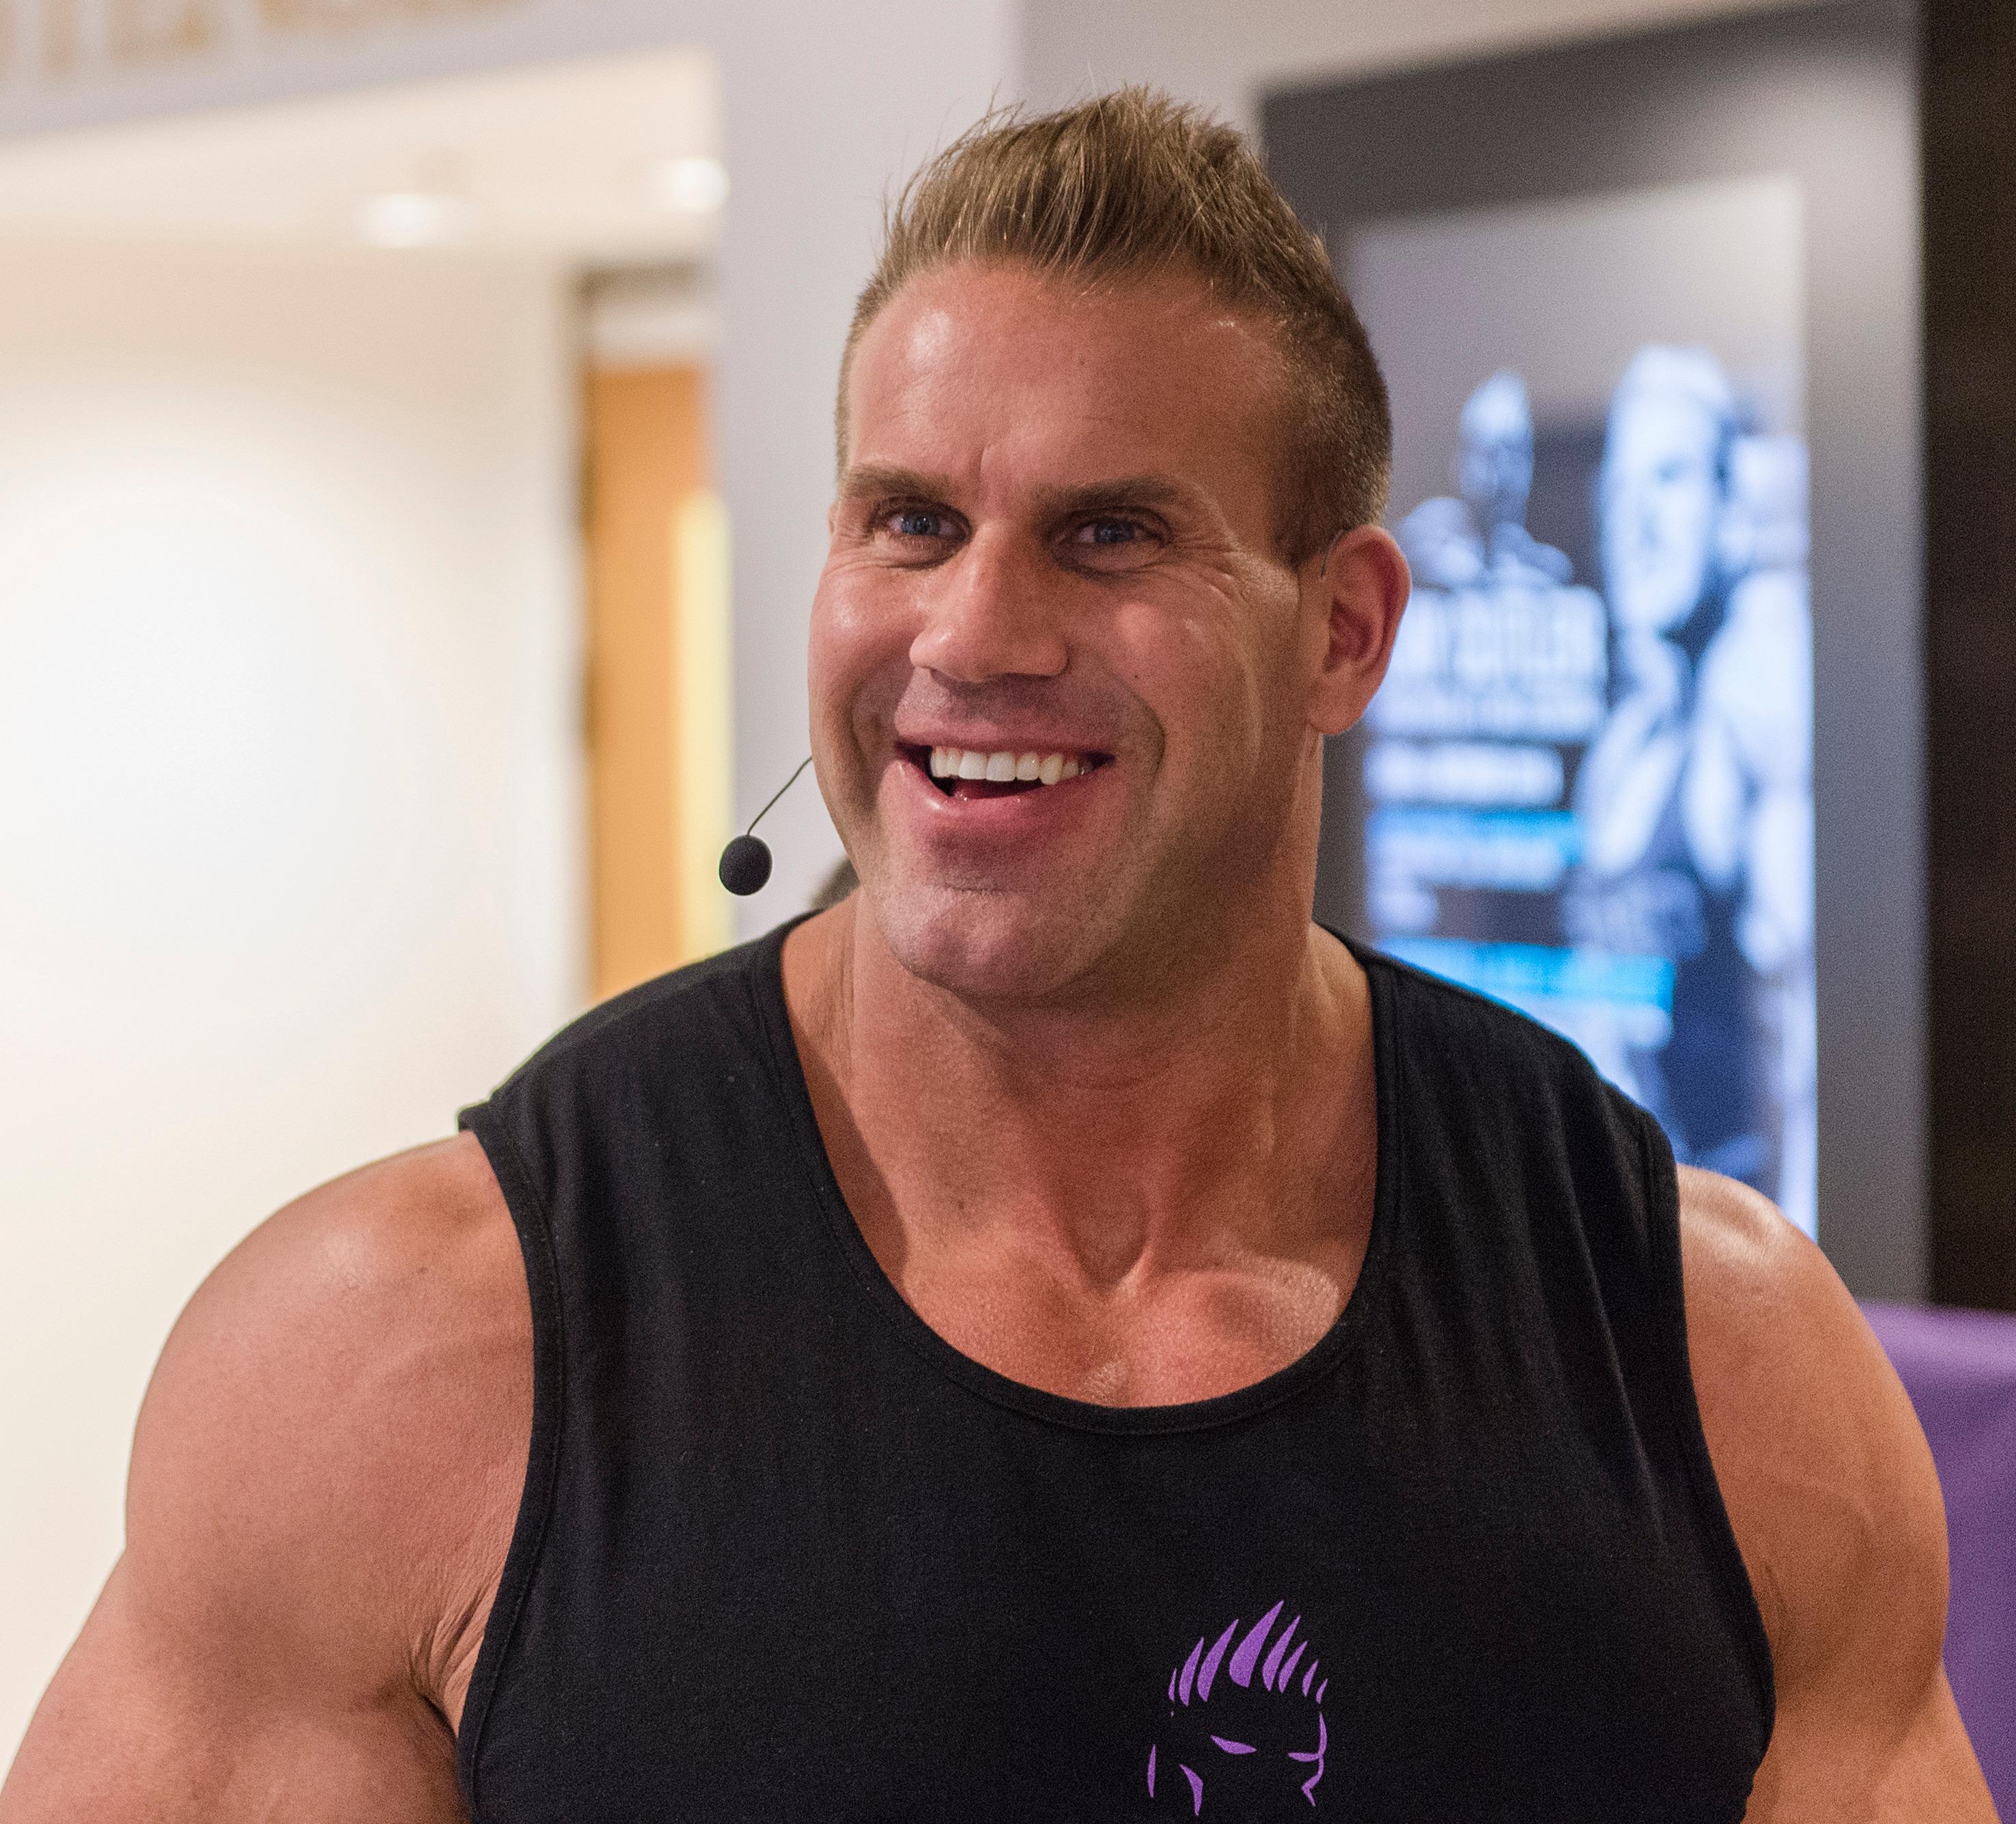 Pin Jay-cutler-bodybuilder on Pinterest